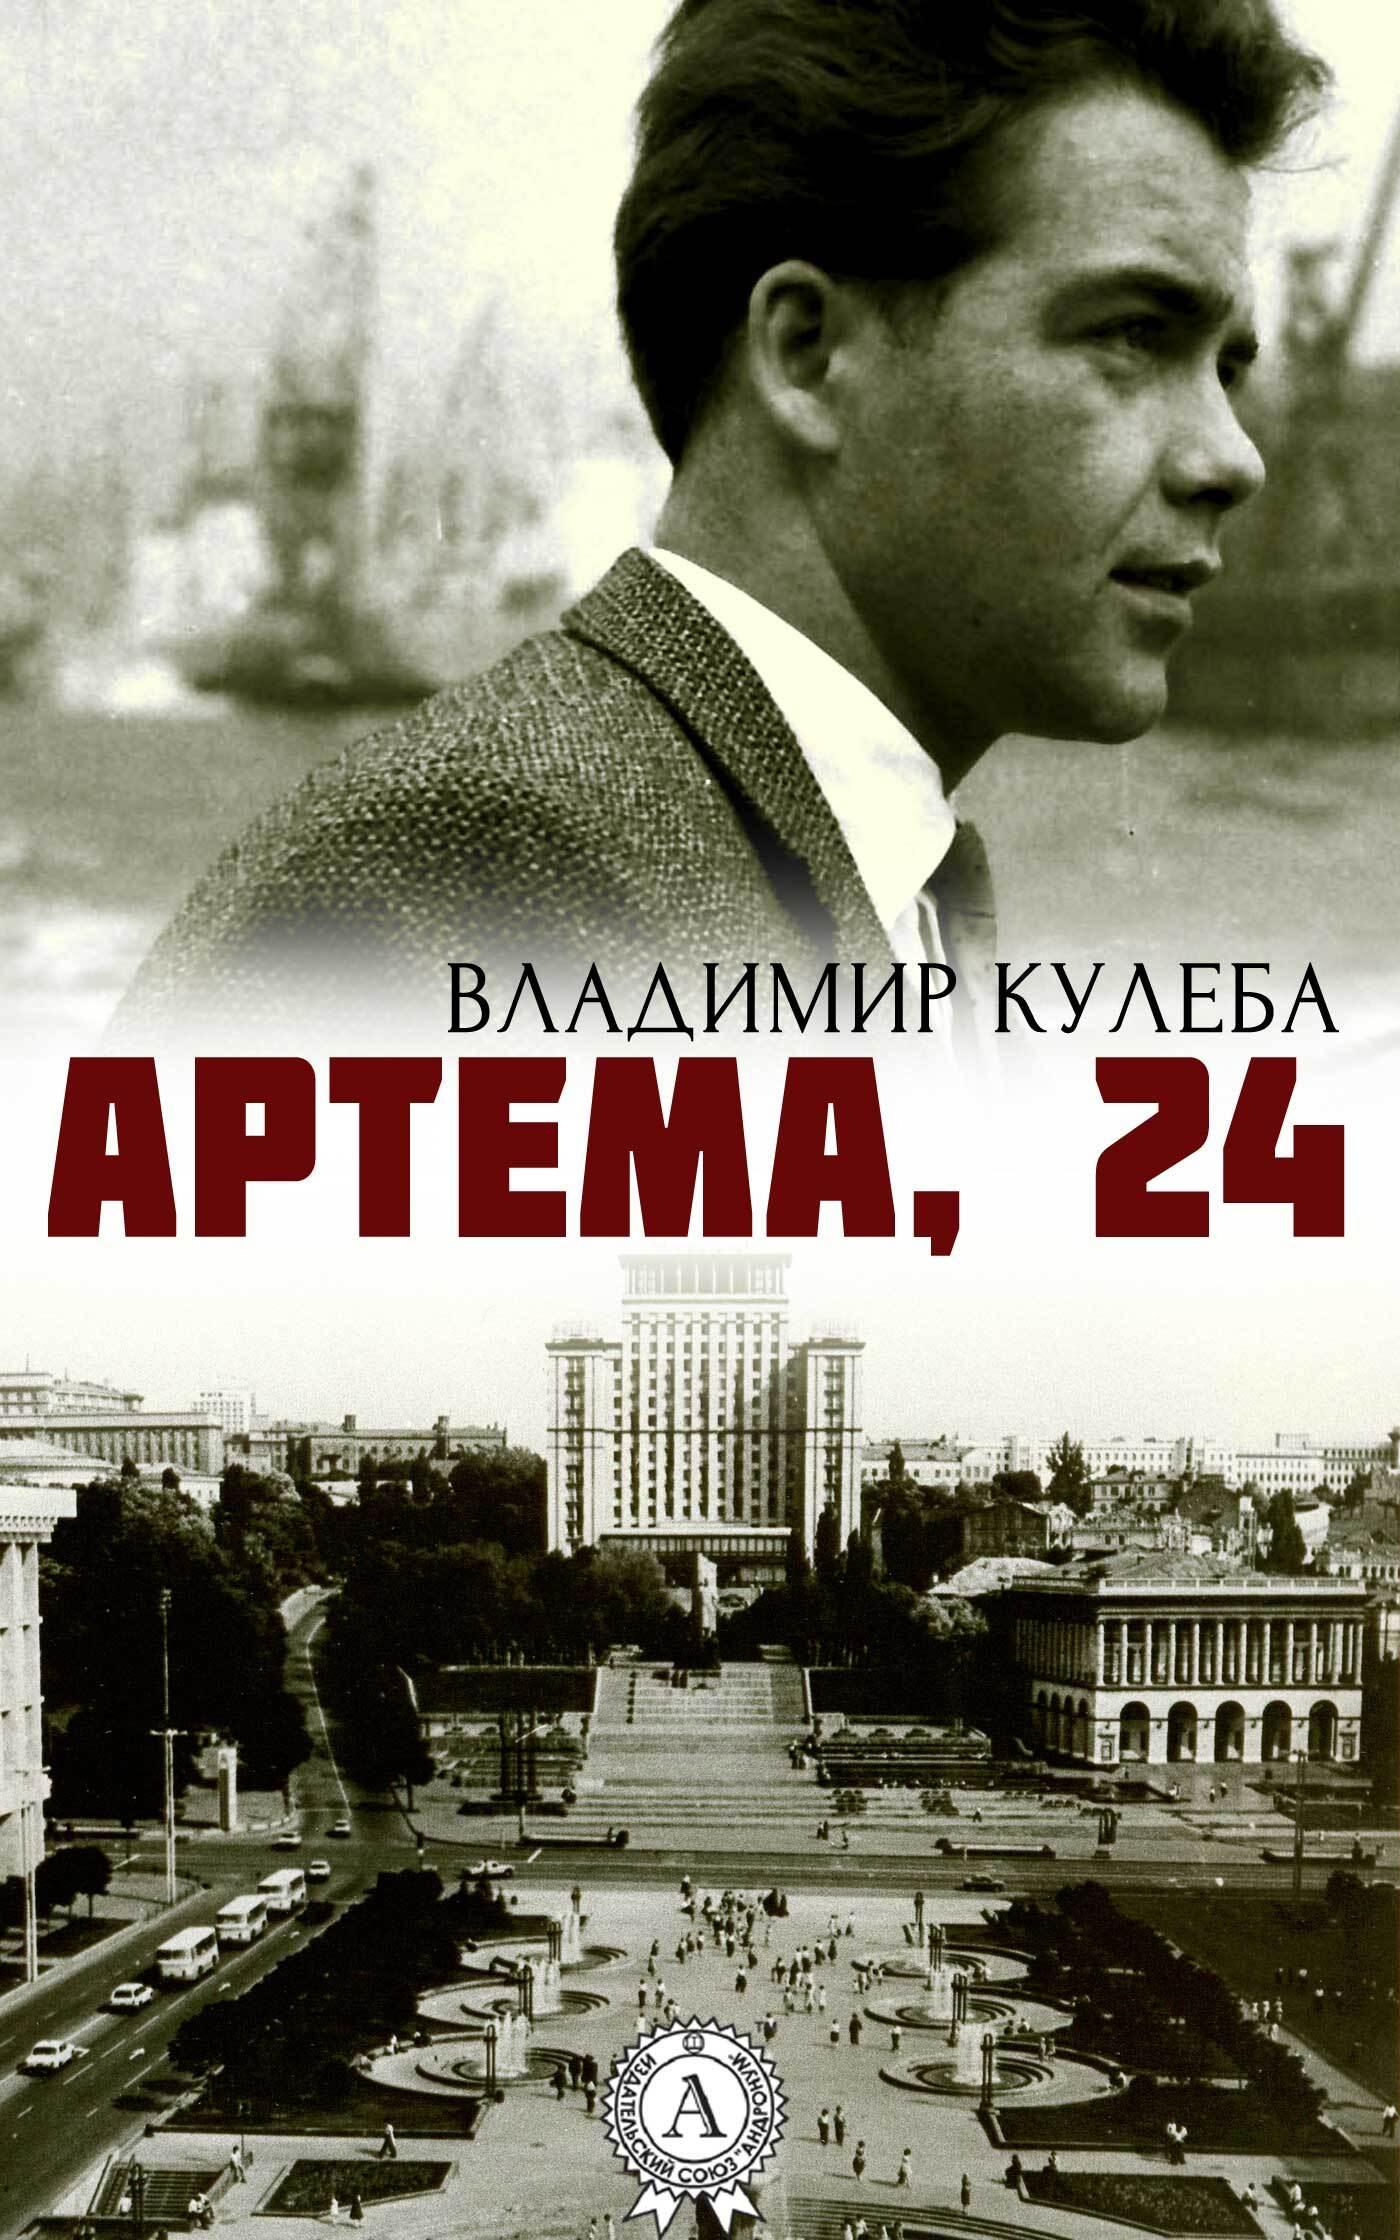 Владимир Кулеба Артема, 24 вранье